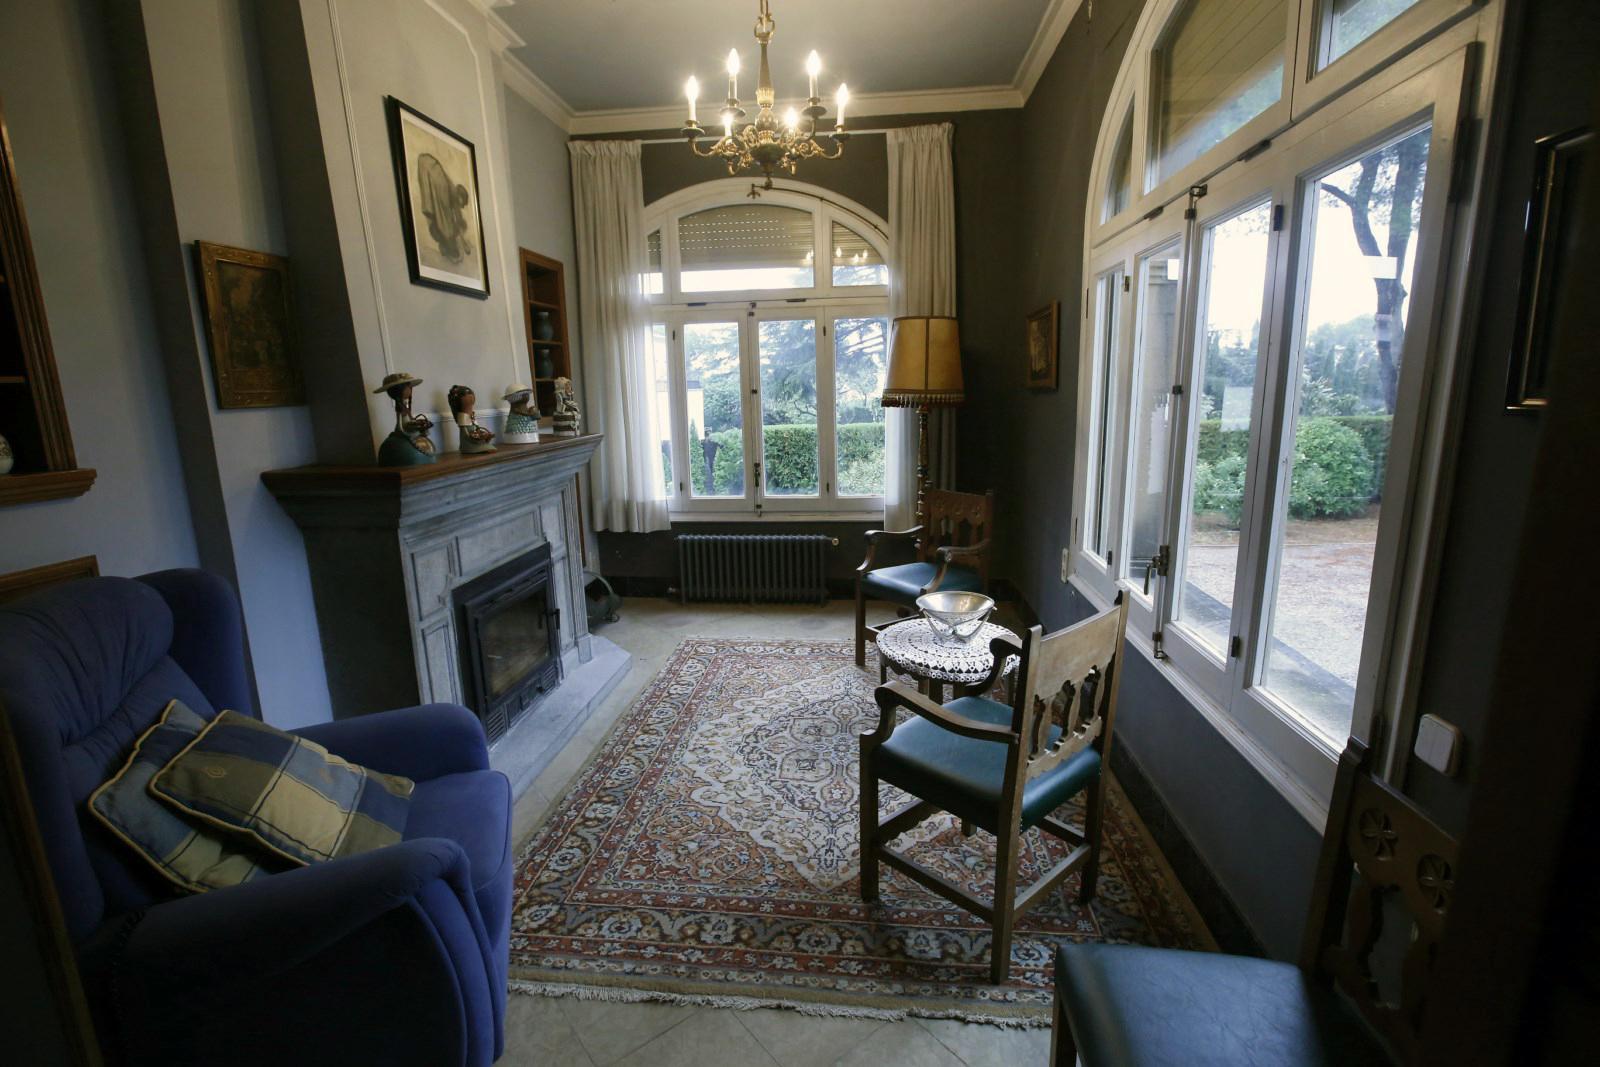 197011 Casa Aislada en venta en Matadepera 4